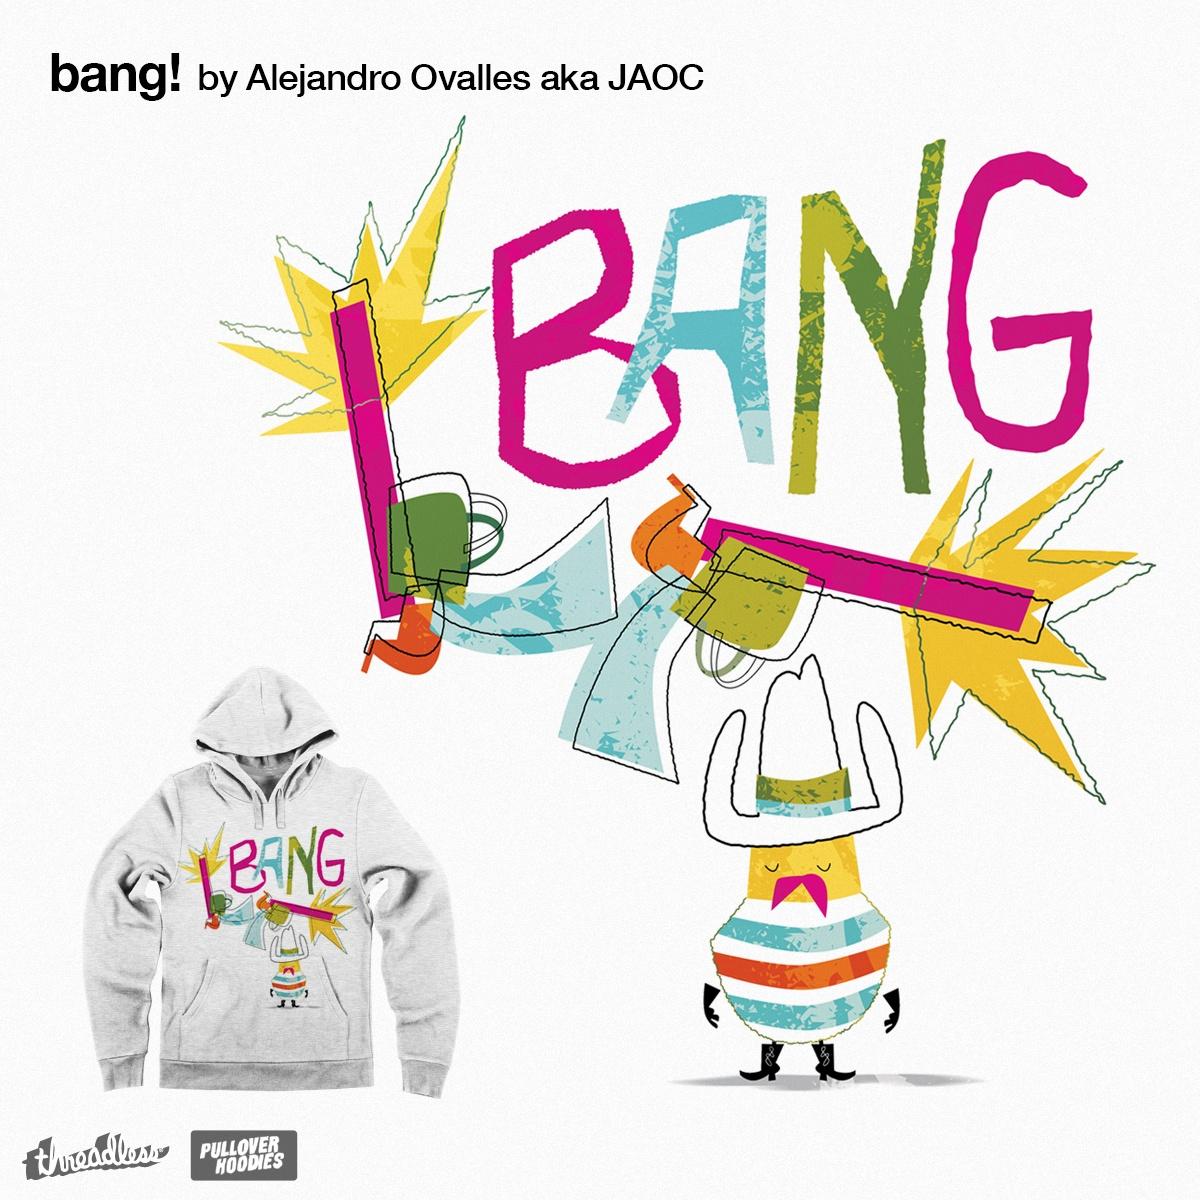 bang! by jaoc28 on Threadless